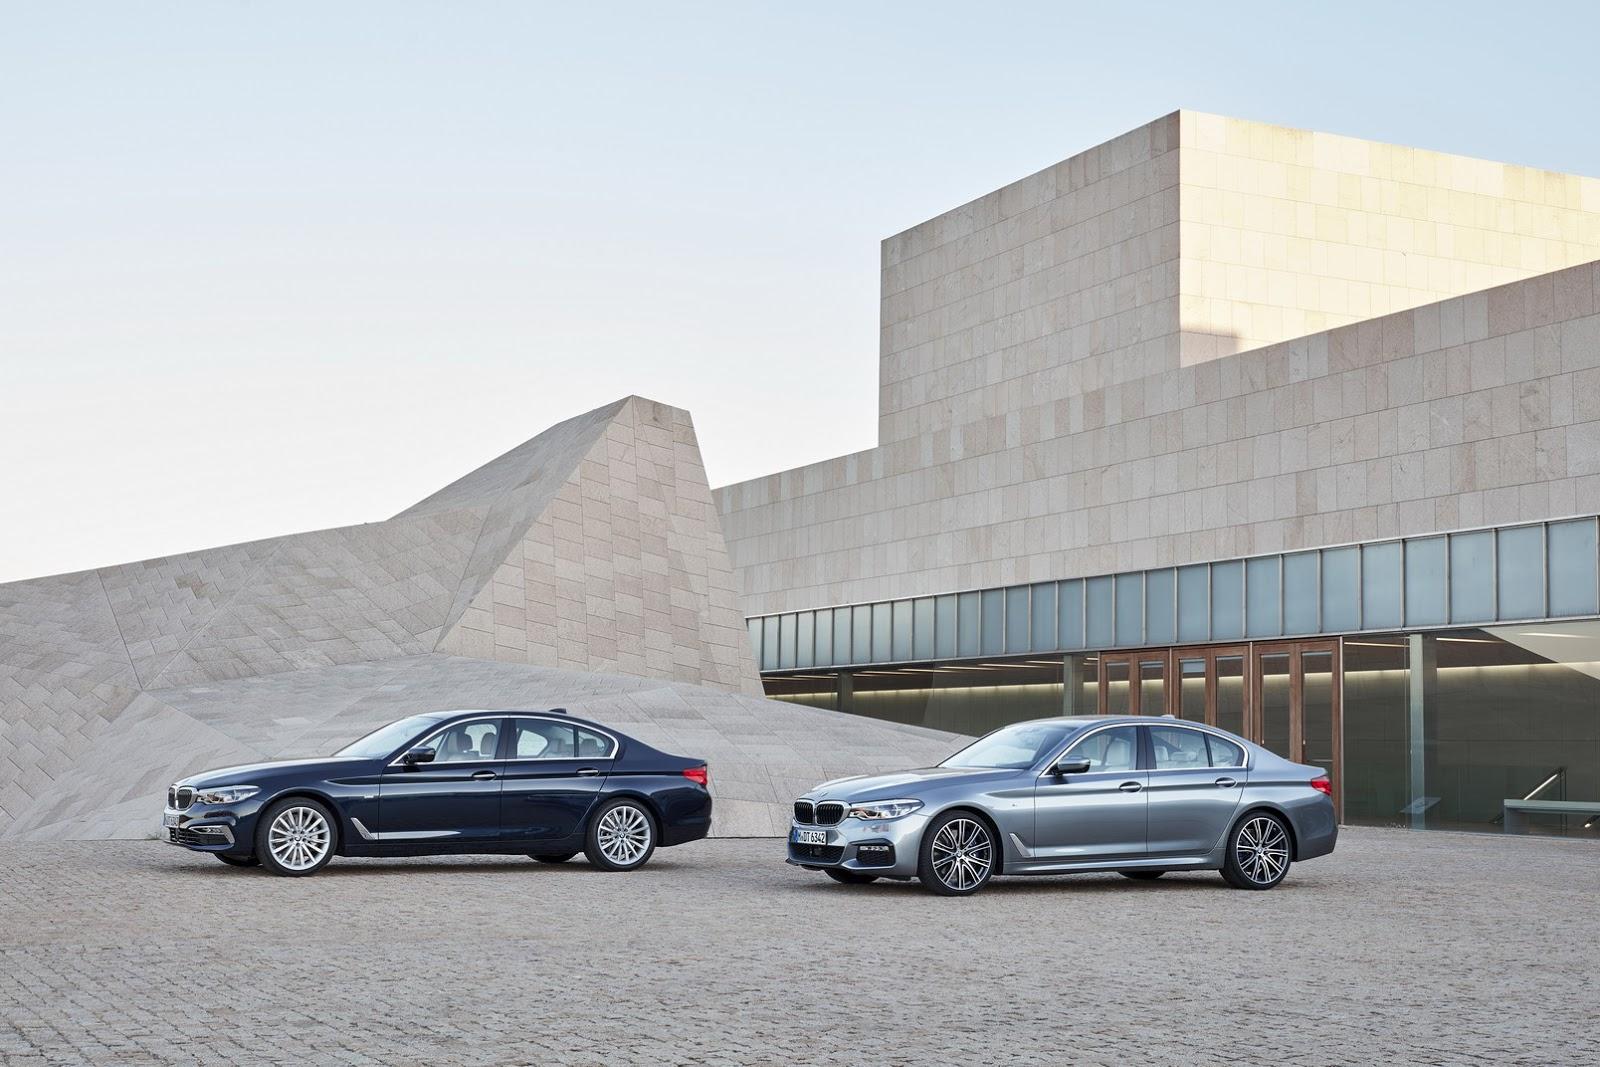 2017-BMW-5-Series-15.jpg